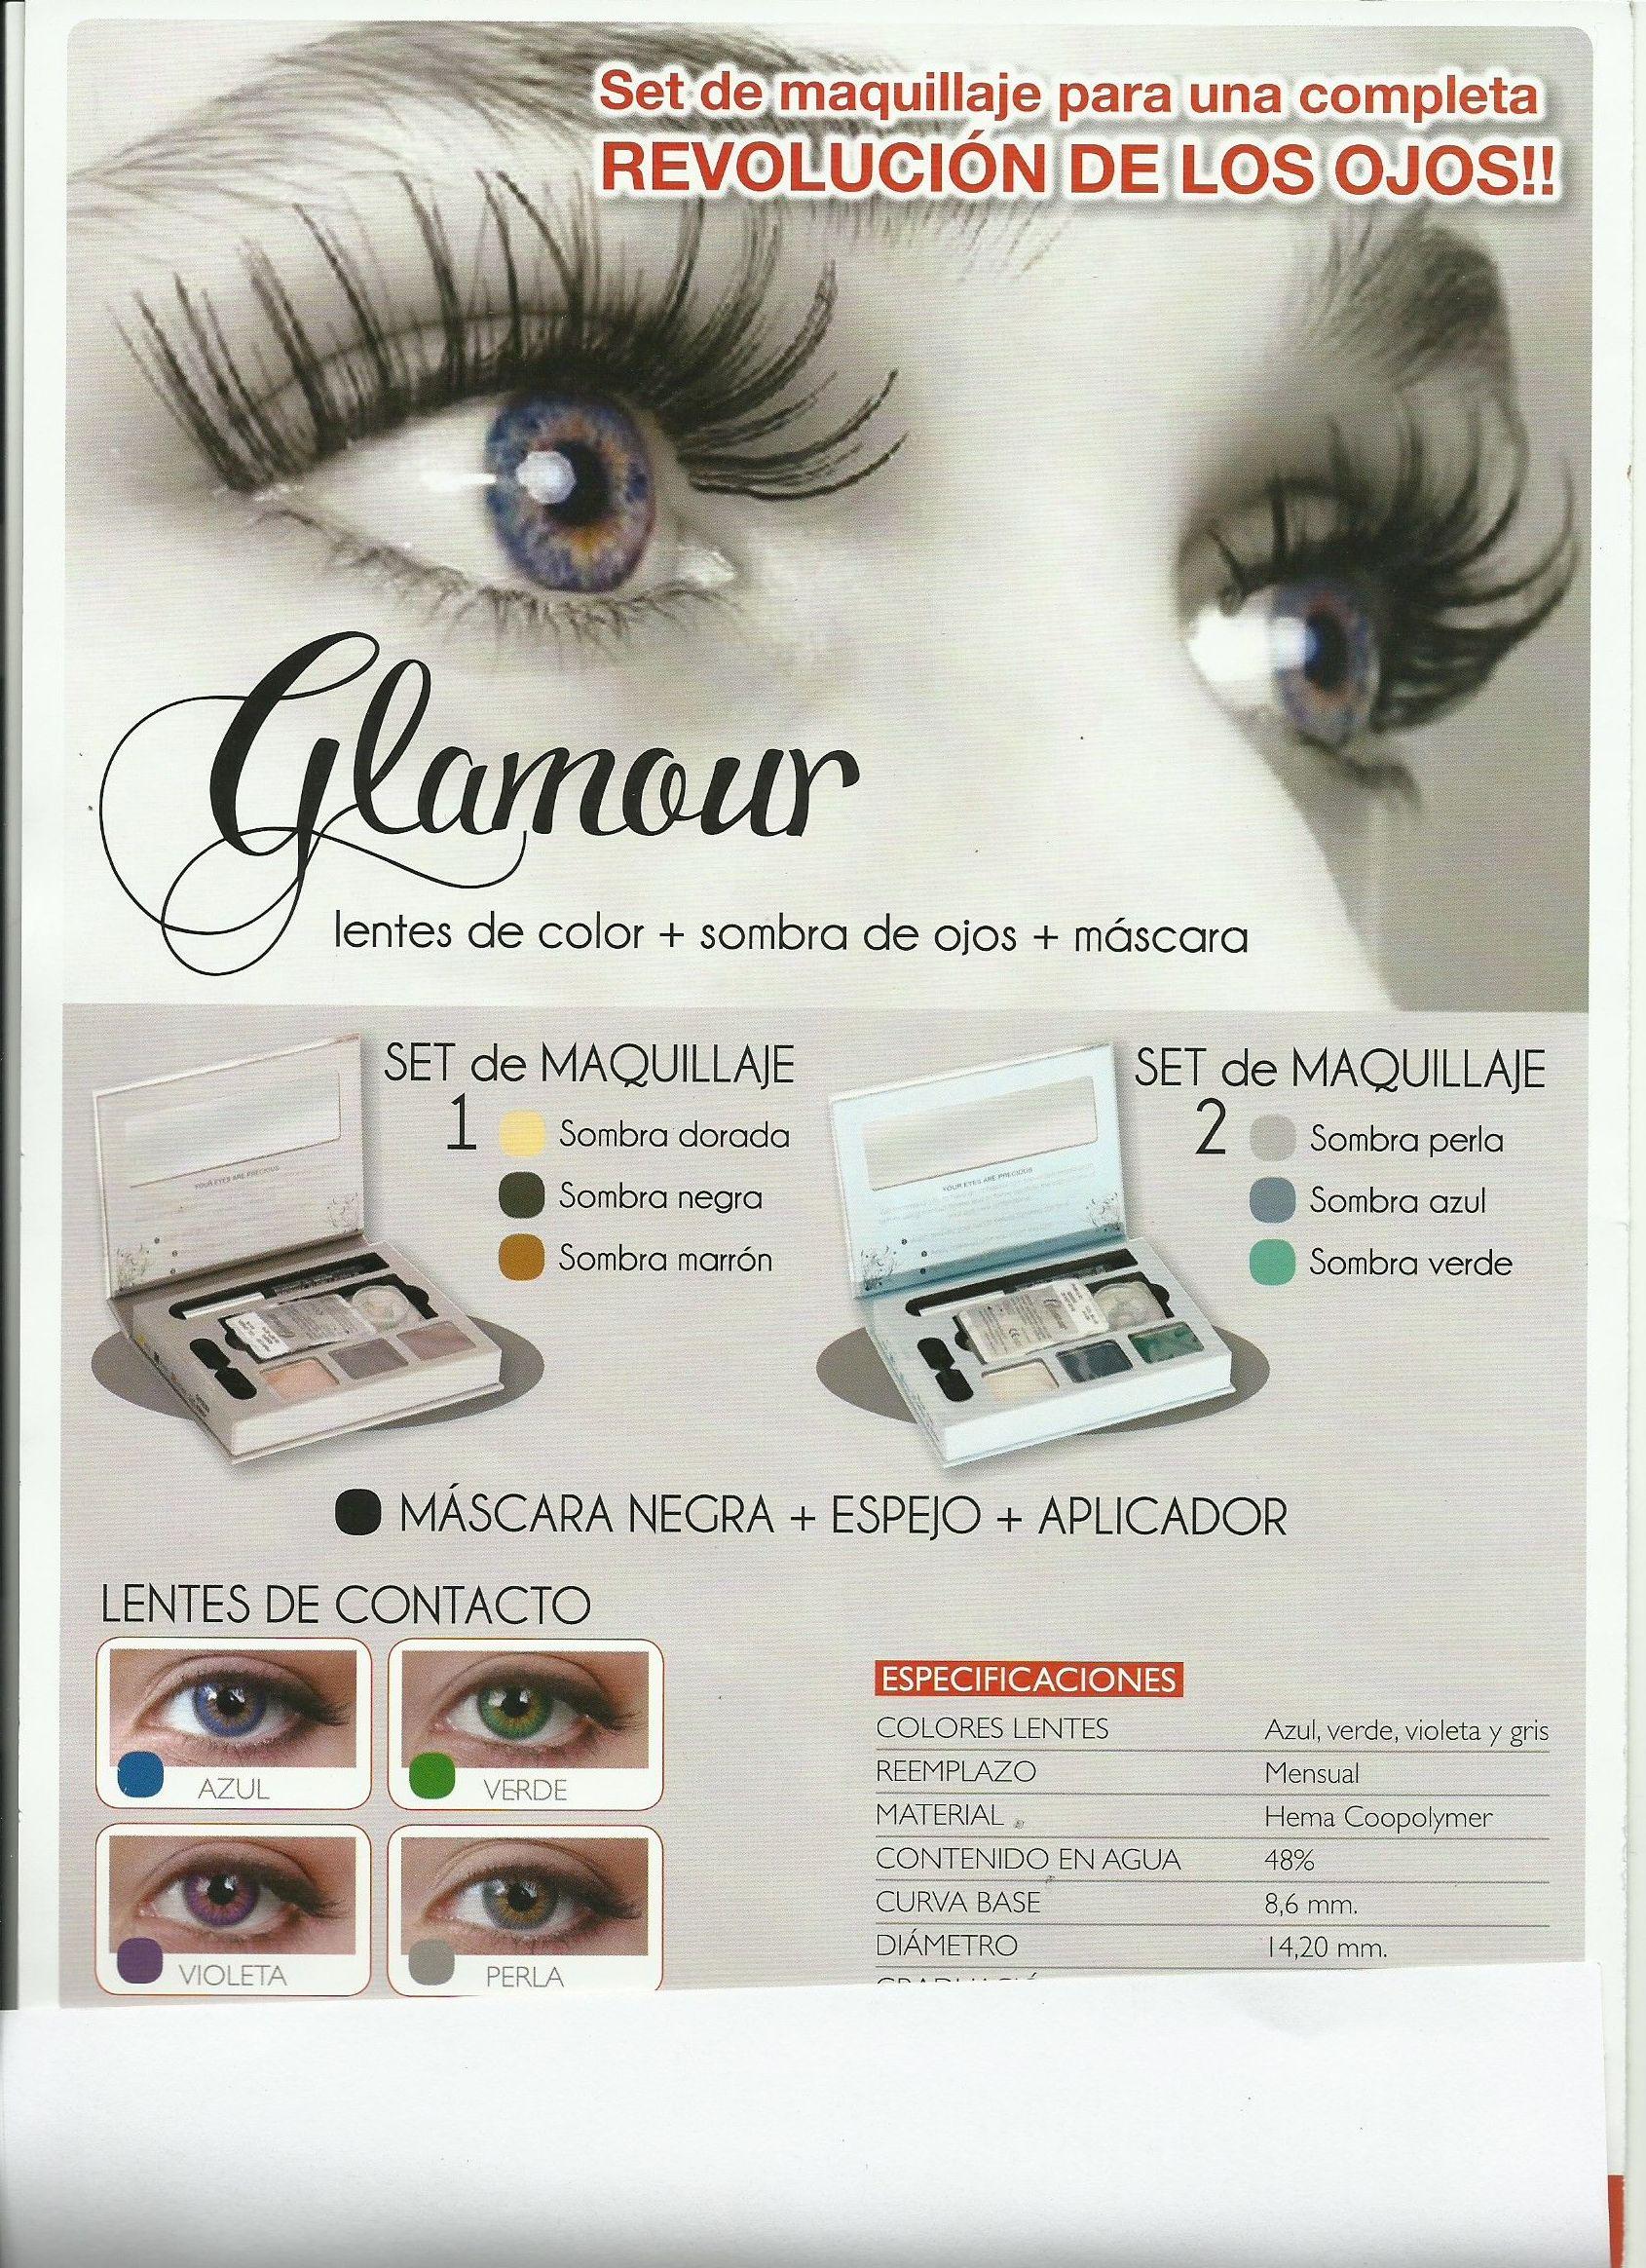 Venta de productos de cosmética y lentes de color en Esplugues de Llobregat, Barcelona